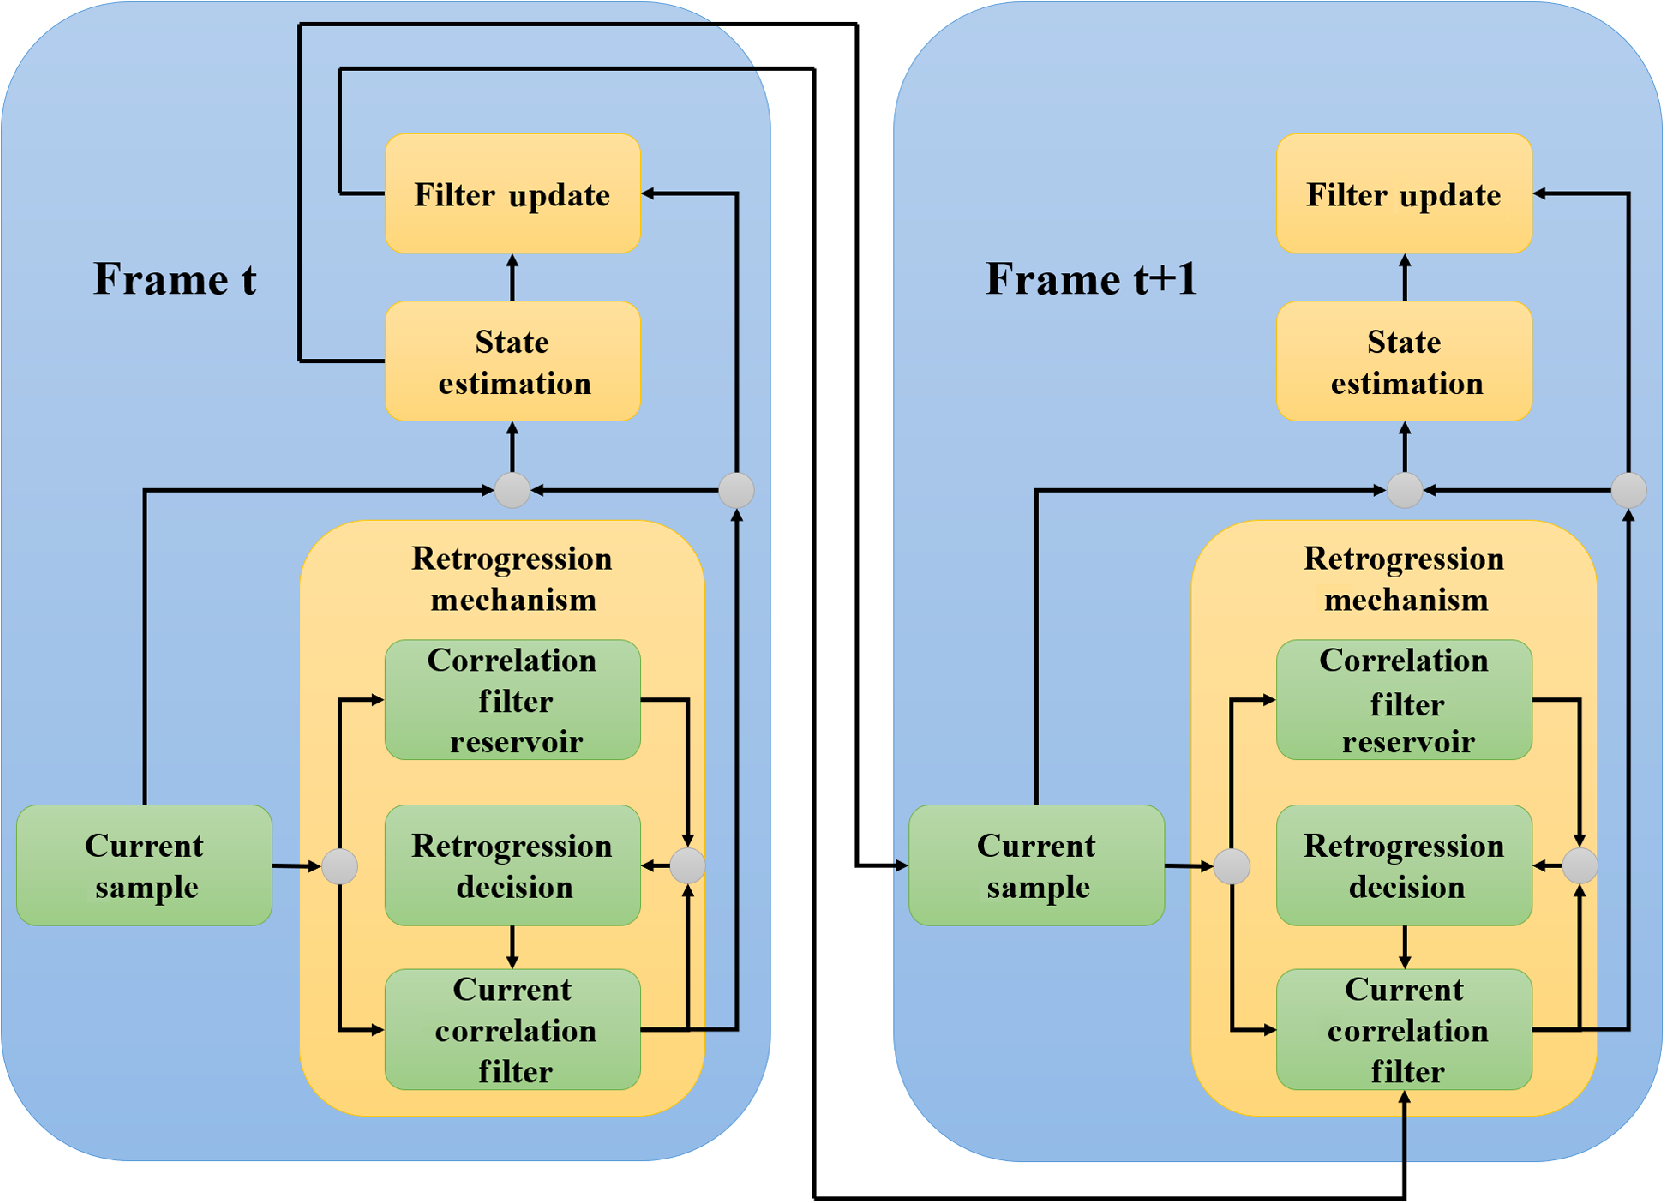 Retrogression of correlation filters for discriminative visual